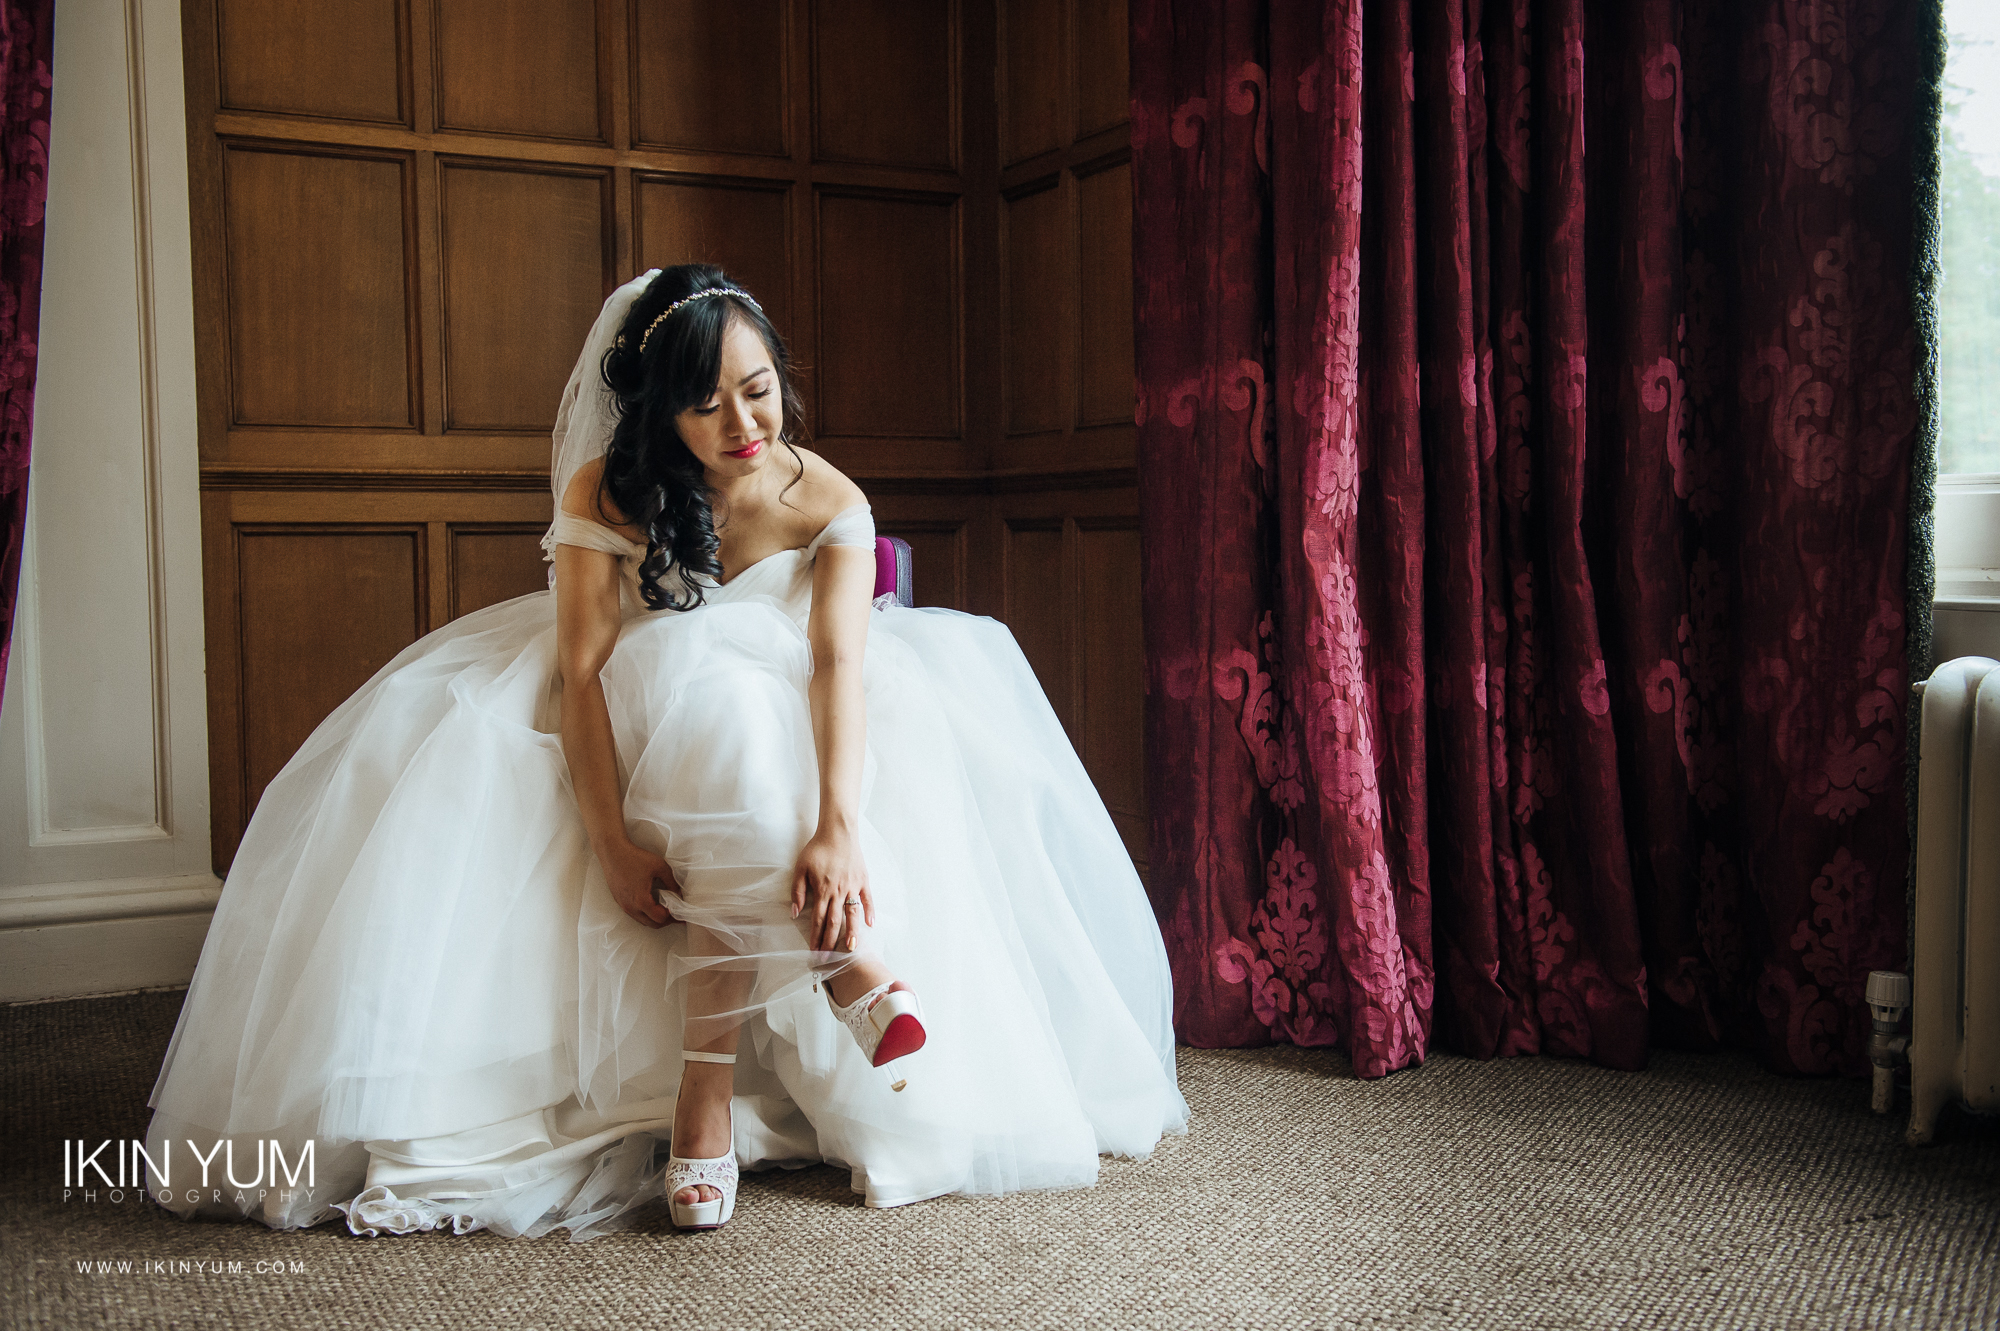 Hampton Manor Wedding - Ikin Yum Photography -063.jpg